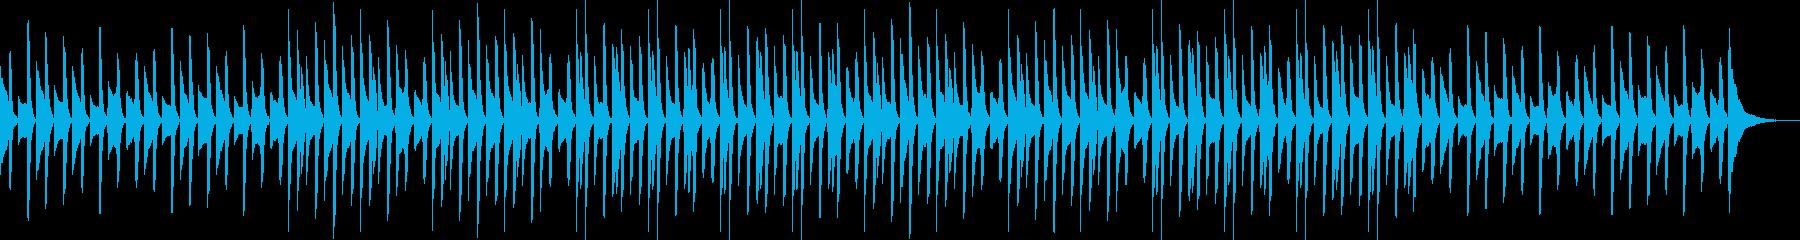 YouTube・ほのぼのピアノソロの再生済みの波形